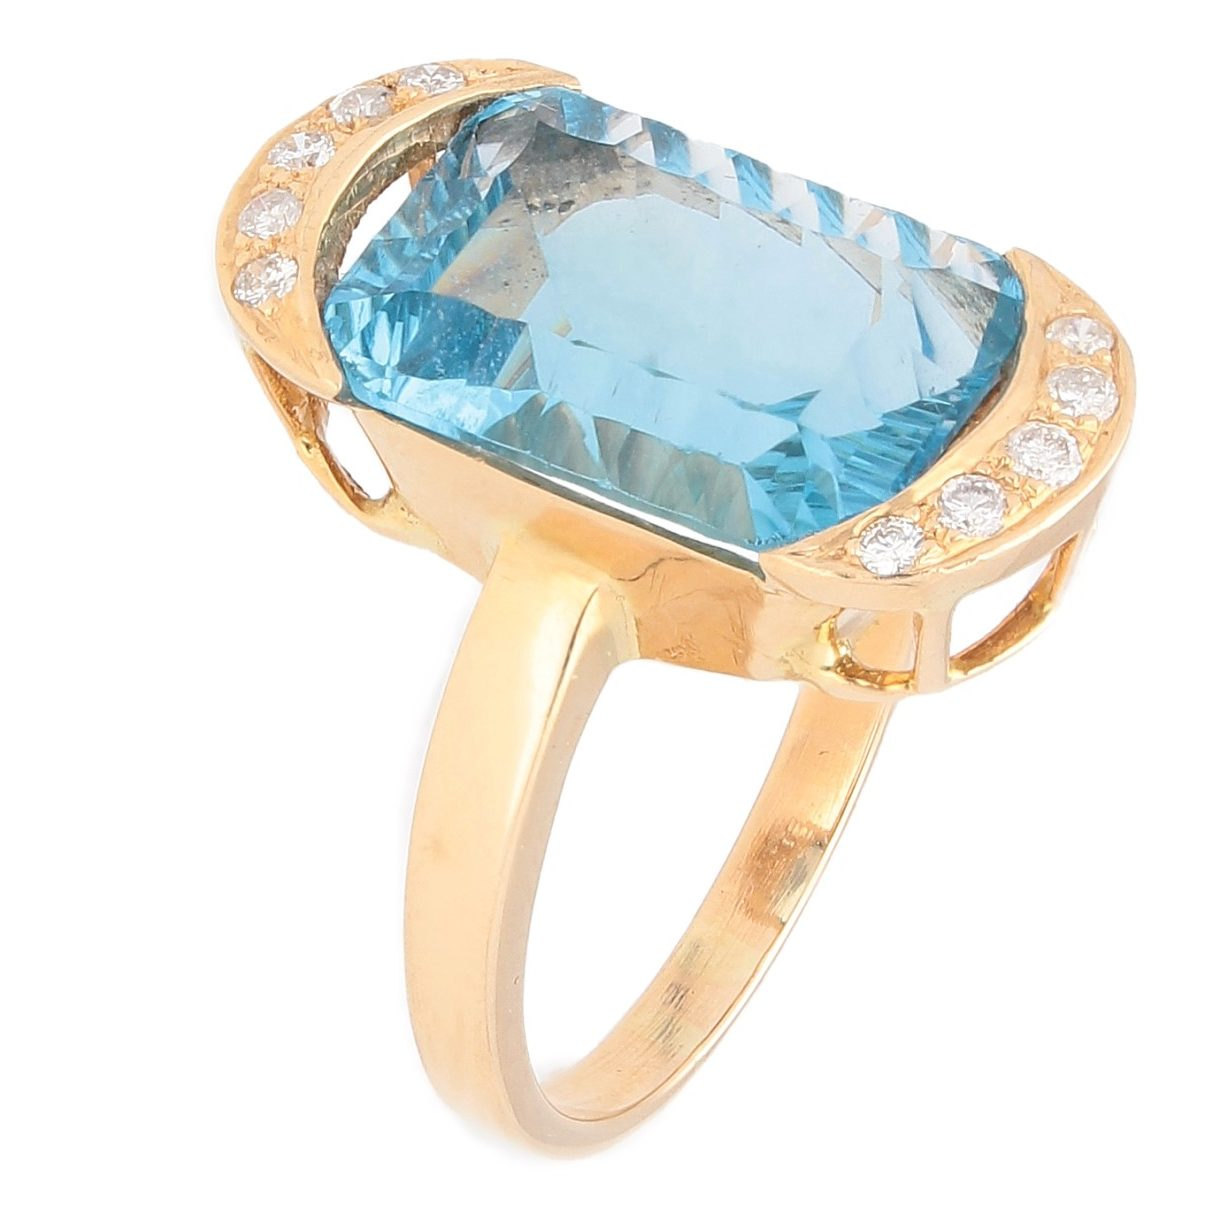 18Ct Yellow Gold 8.88ct Blue Topaz Solitaire W/ Diamond